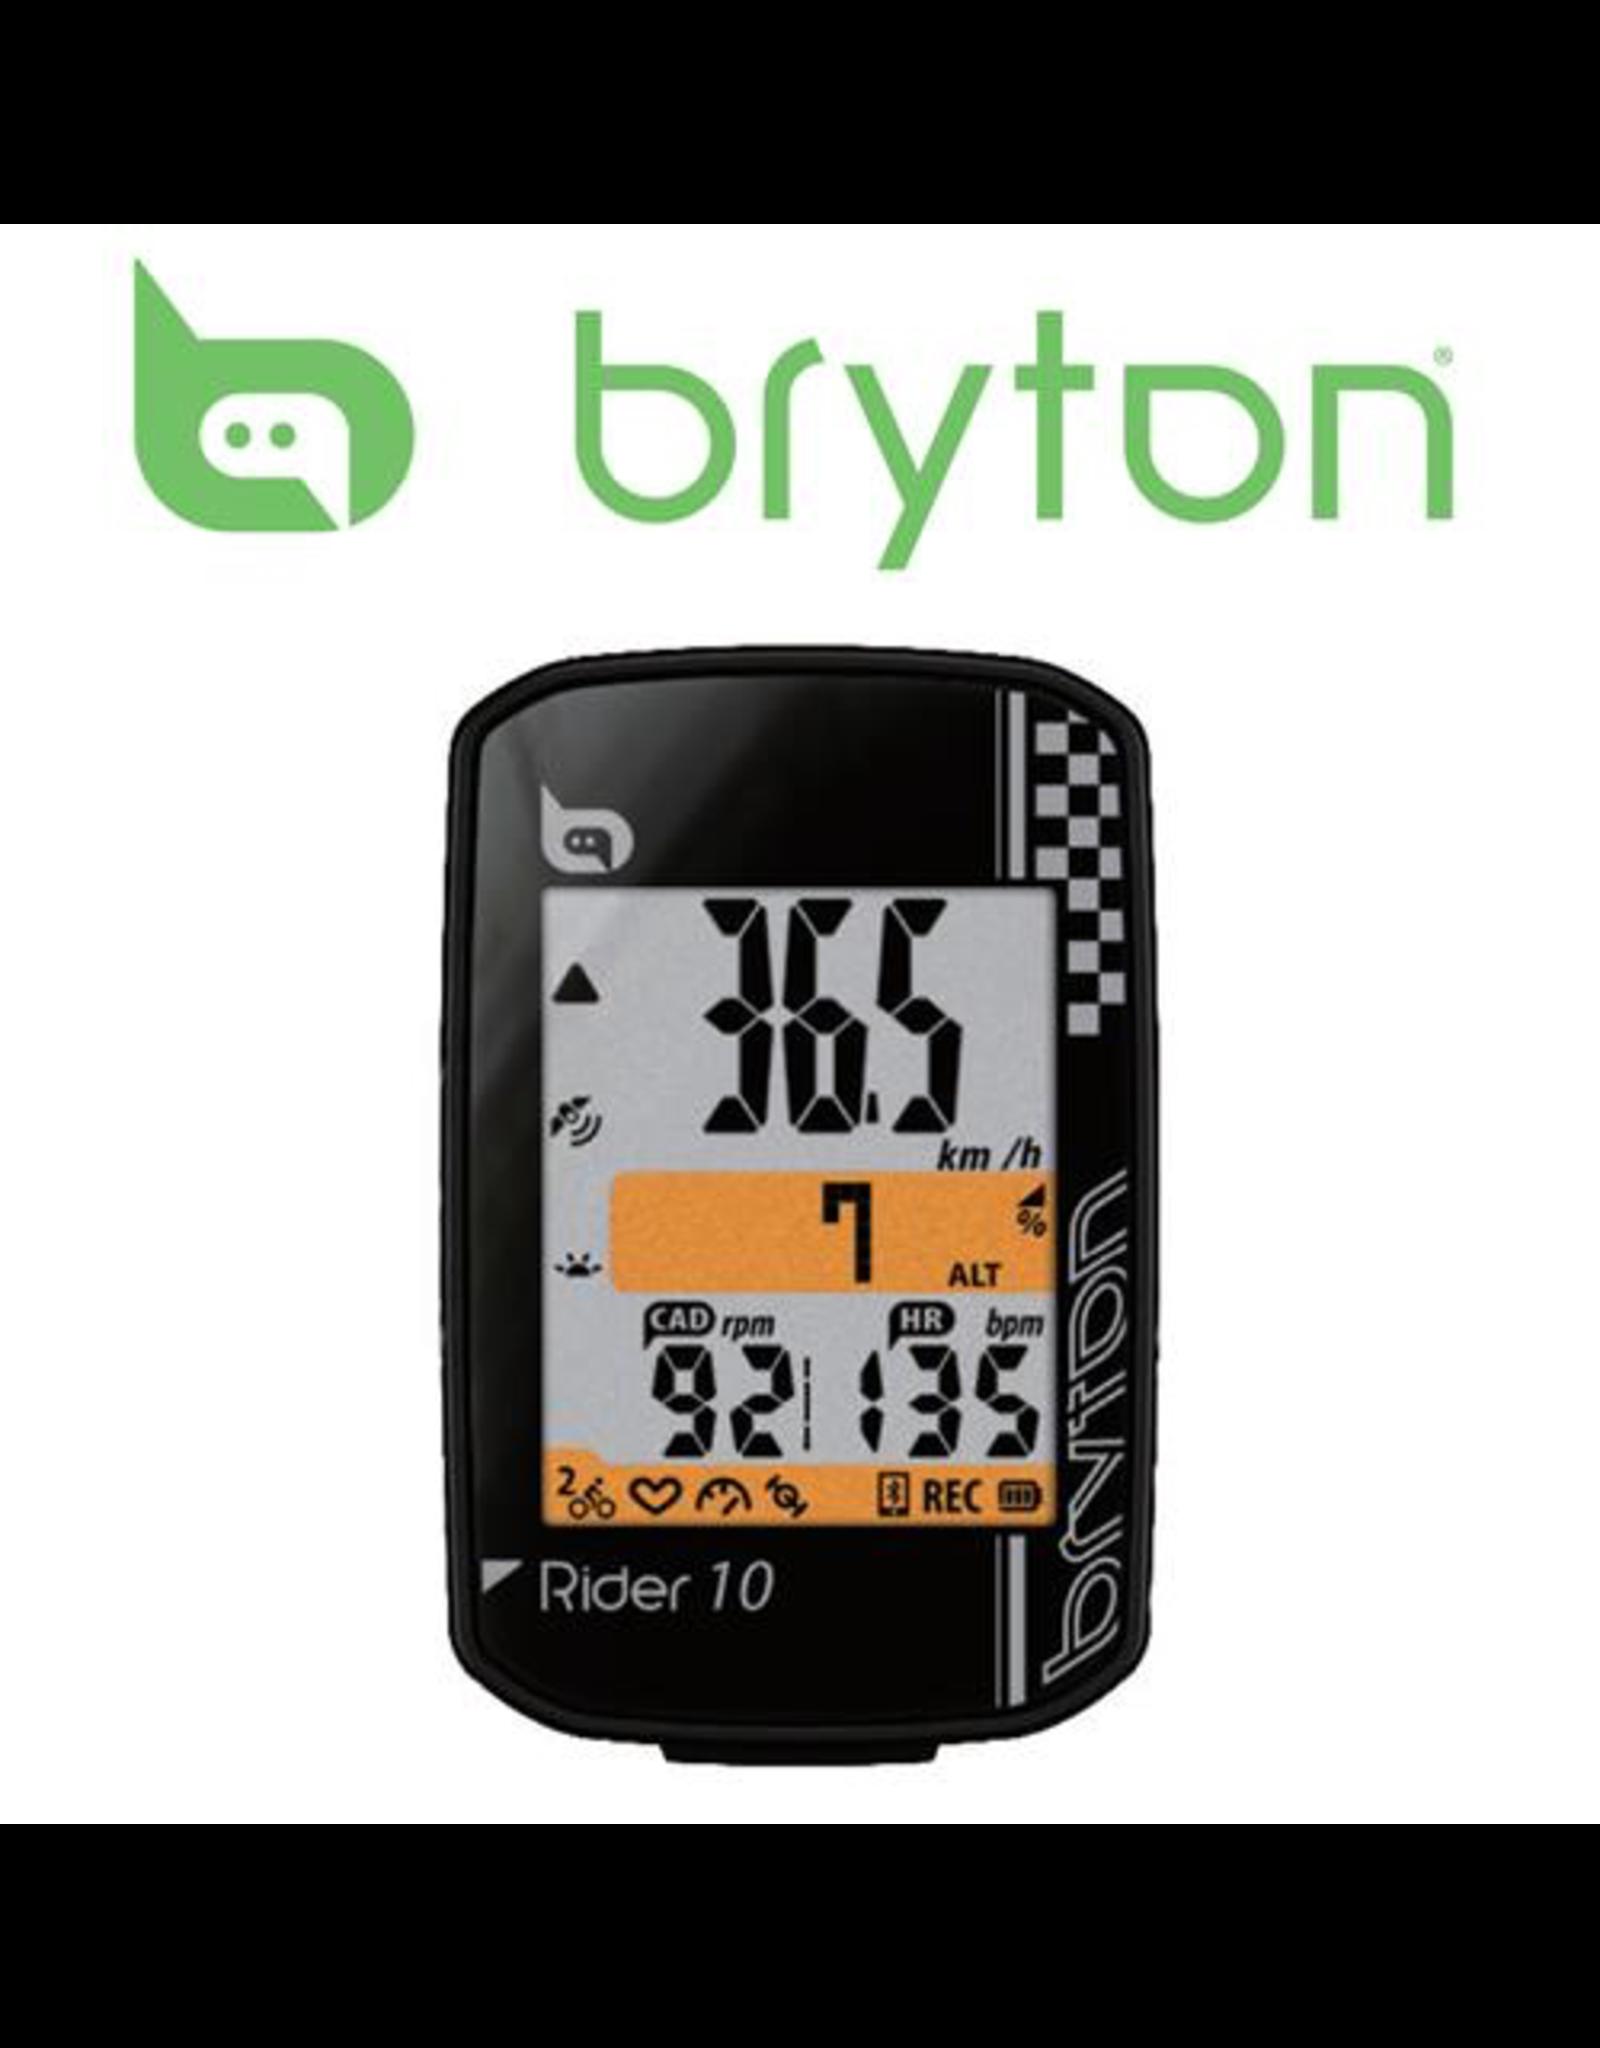 BRYTON CYCLE COMPUTER BRYTON RIDER 10E - GPS